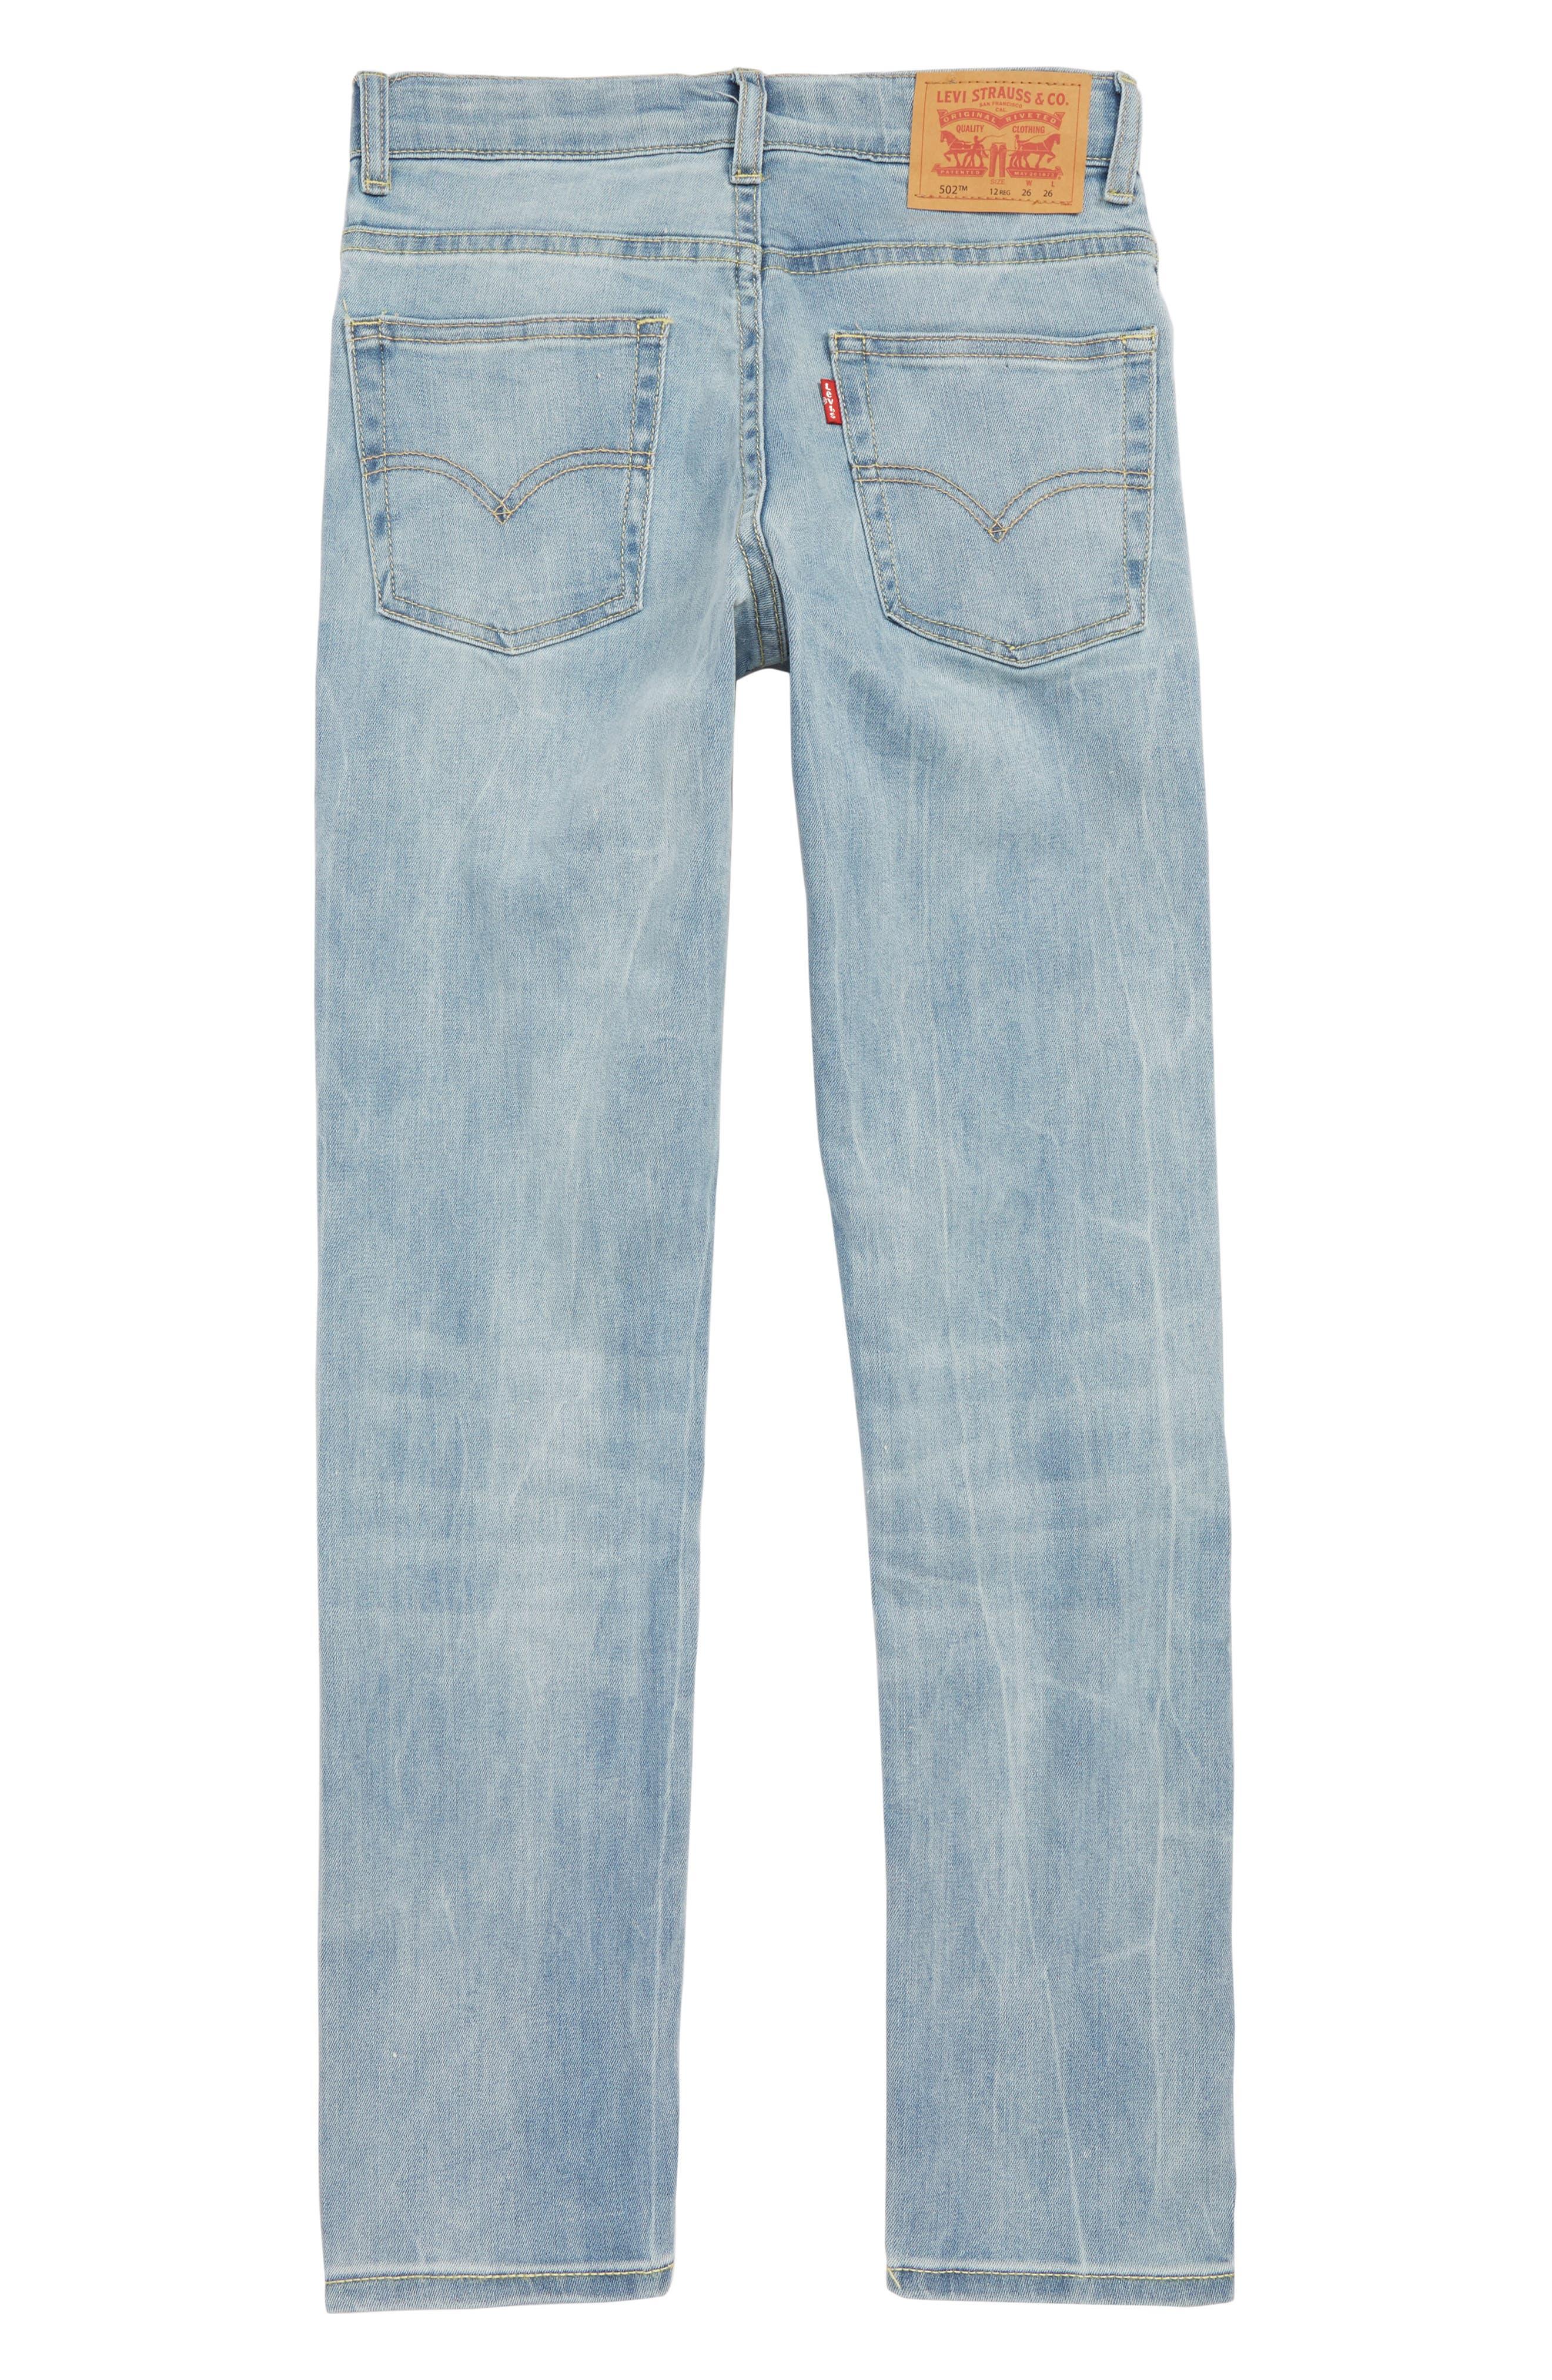 LEVI'S<SUP>®</SUP>,                             Levi's<sup>®</sup> 502<sup>™</sup> Regular Taper Jeans,                             Alternate thumbnail 2, color,                             YOSEMITE FALLS